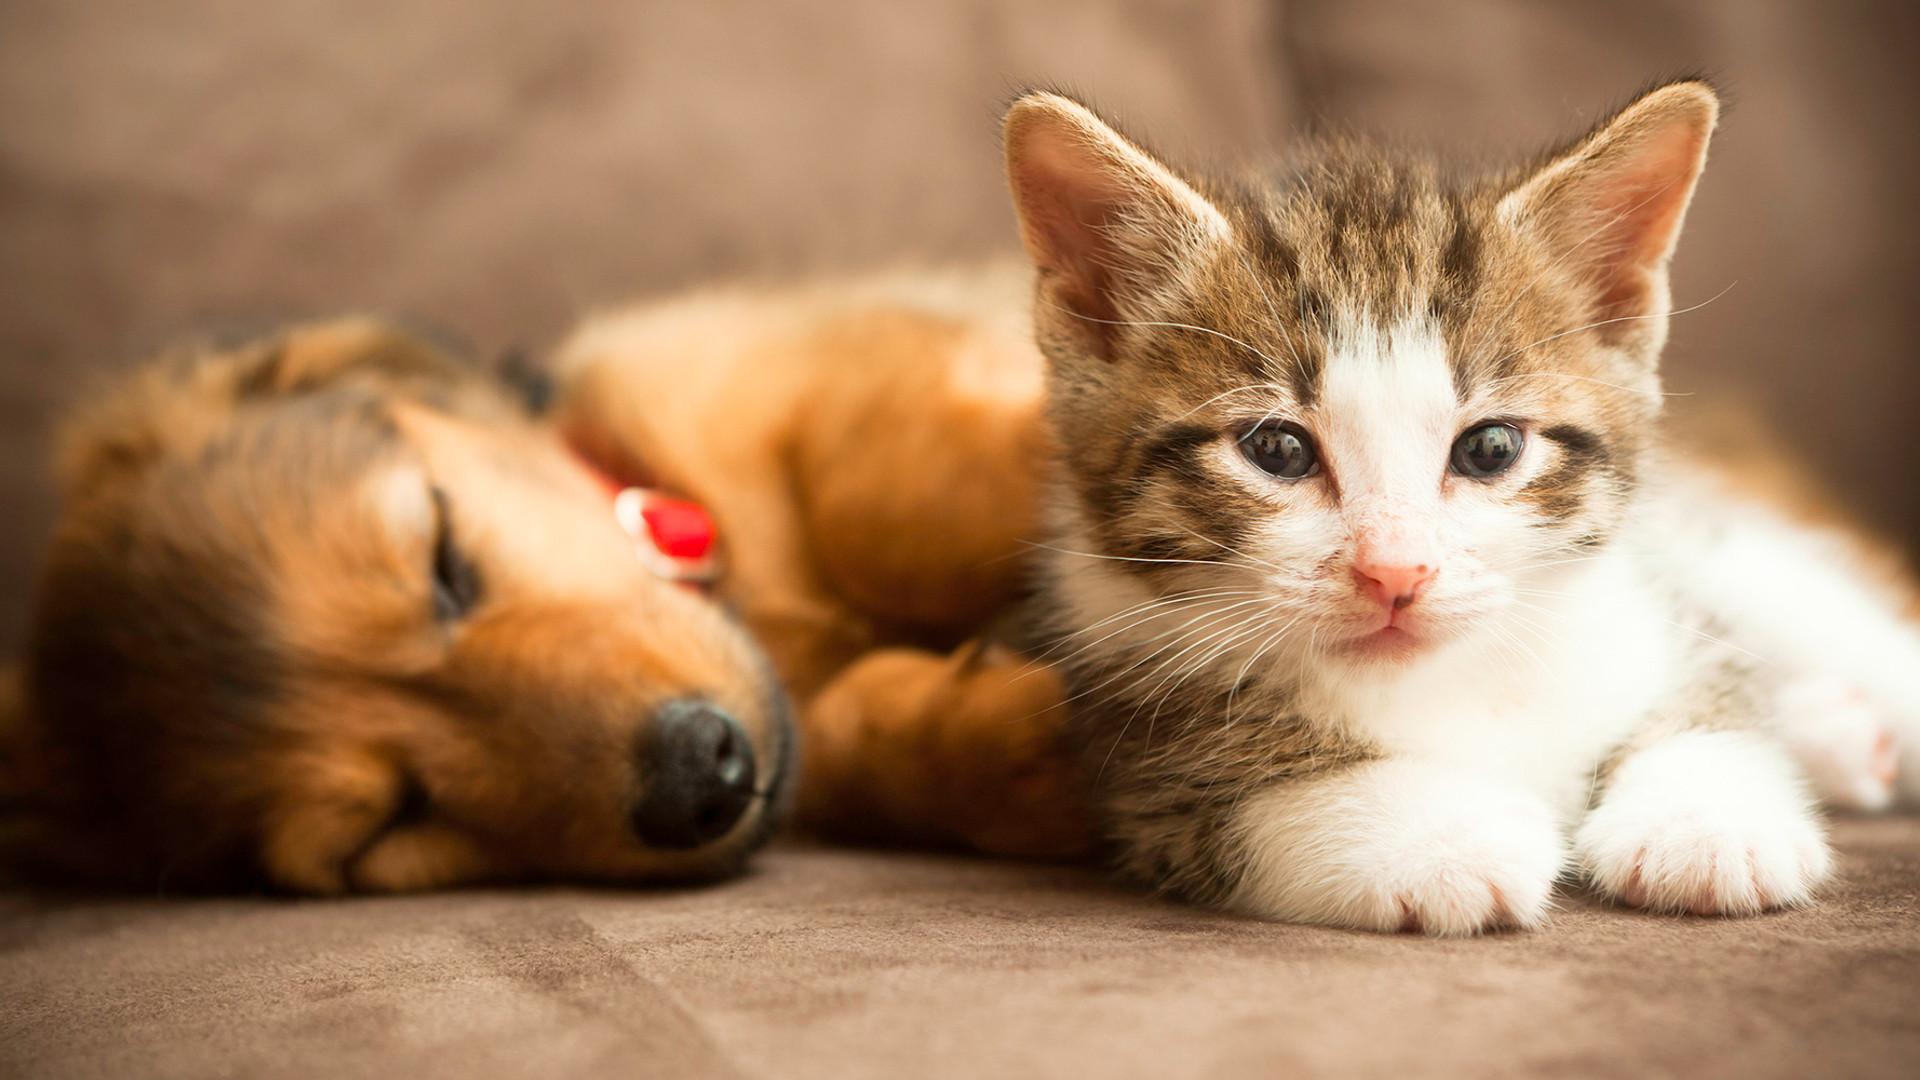 stock-dog-cat-today-181230-main-01_97f0d